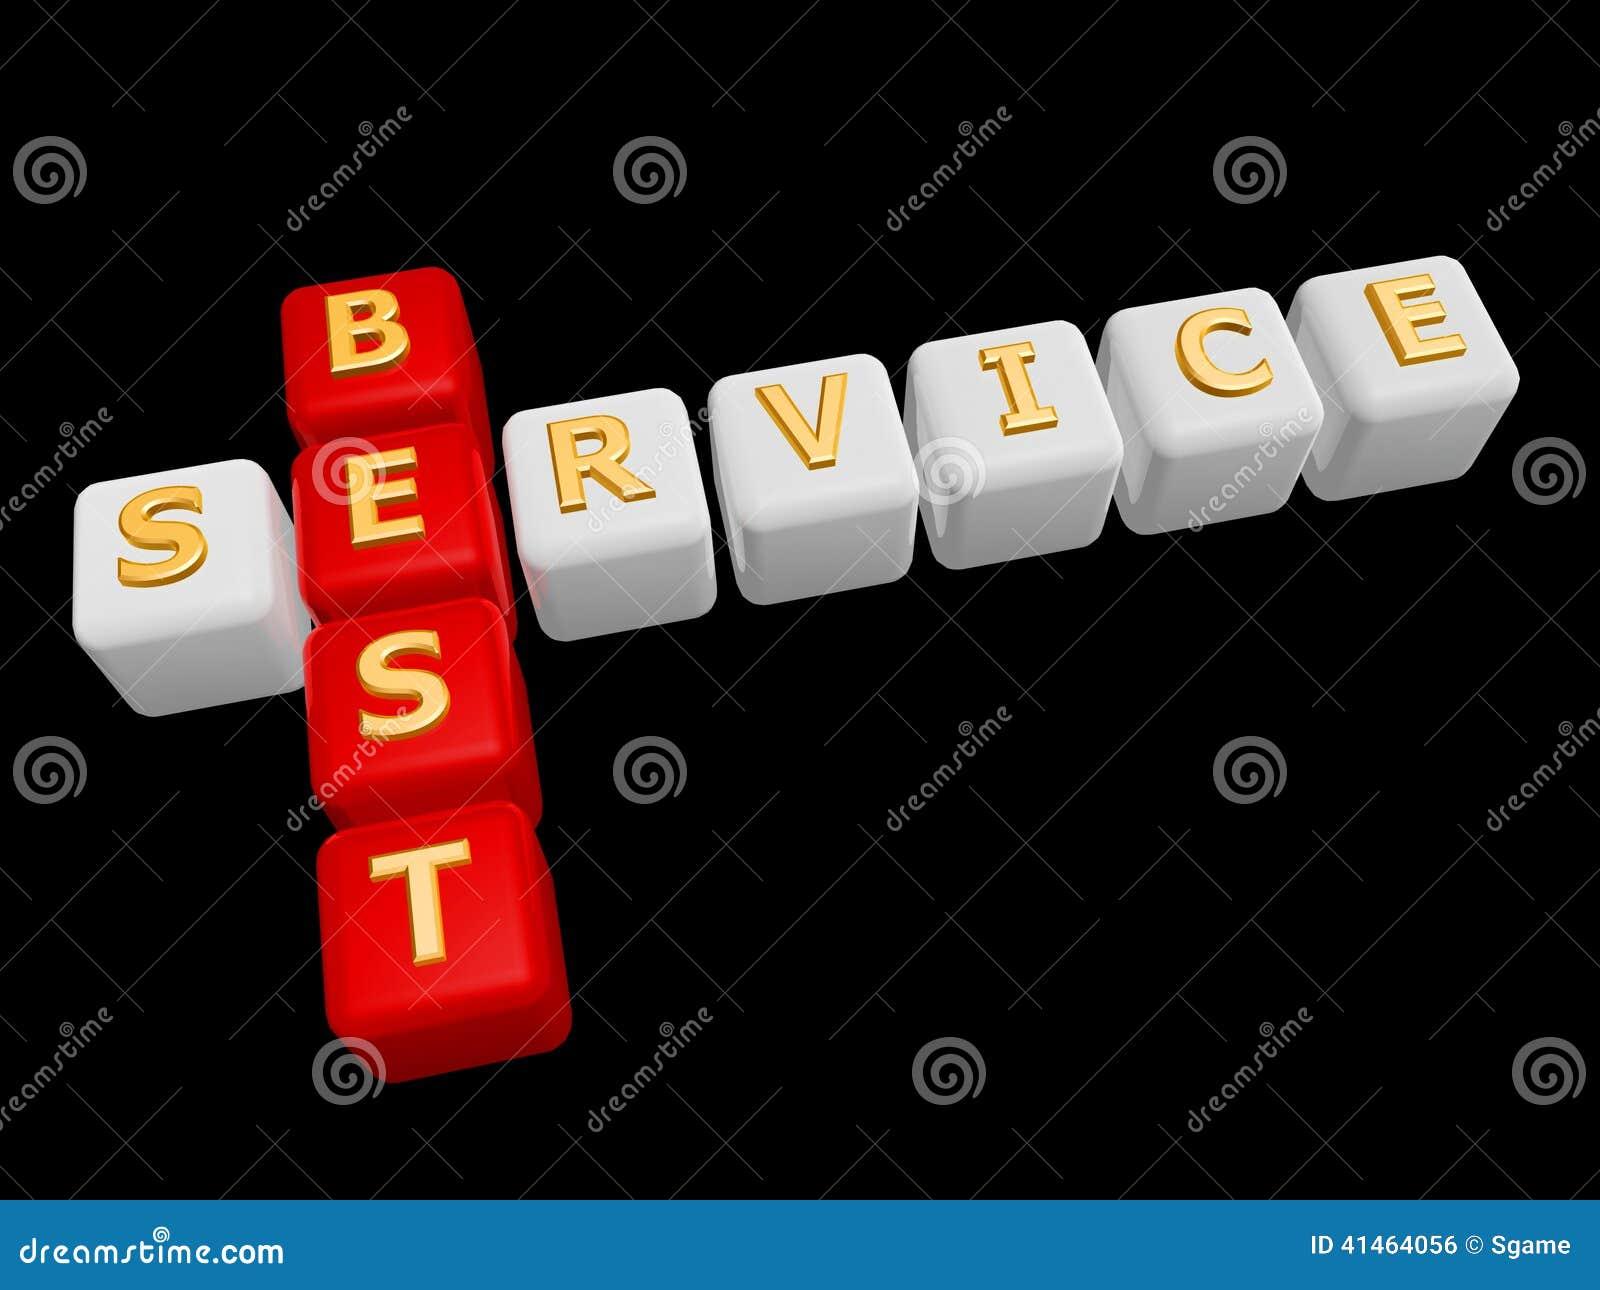 Best Service Cross Word Stock Photo  Image Of Brick